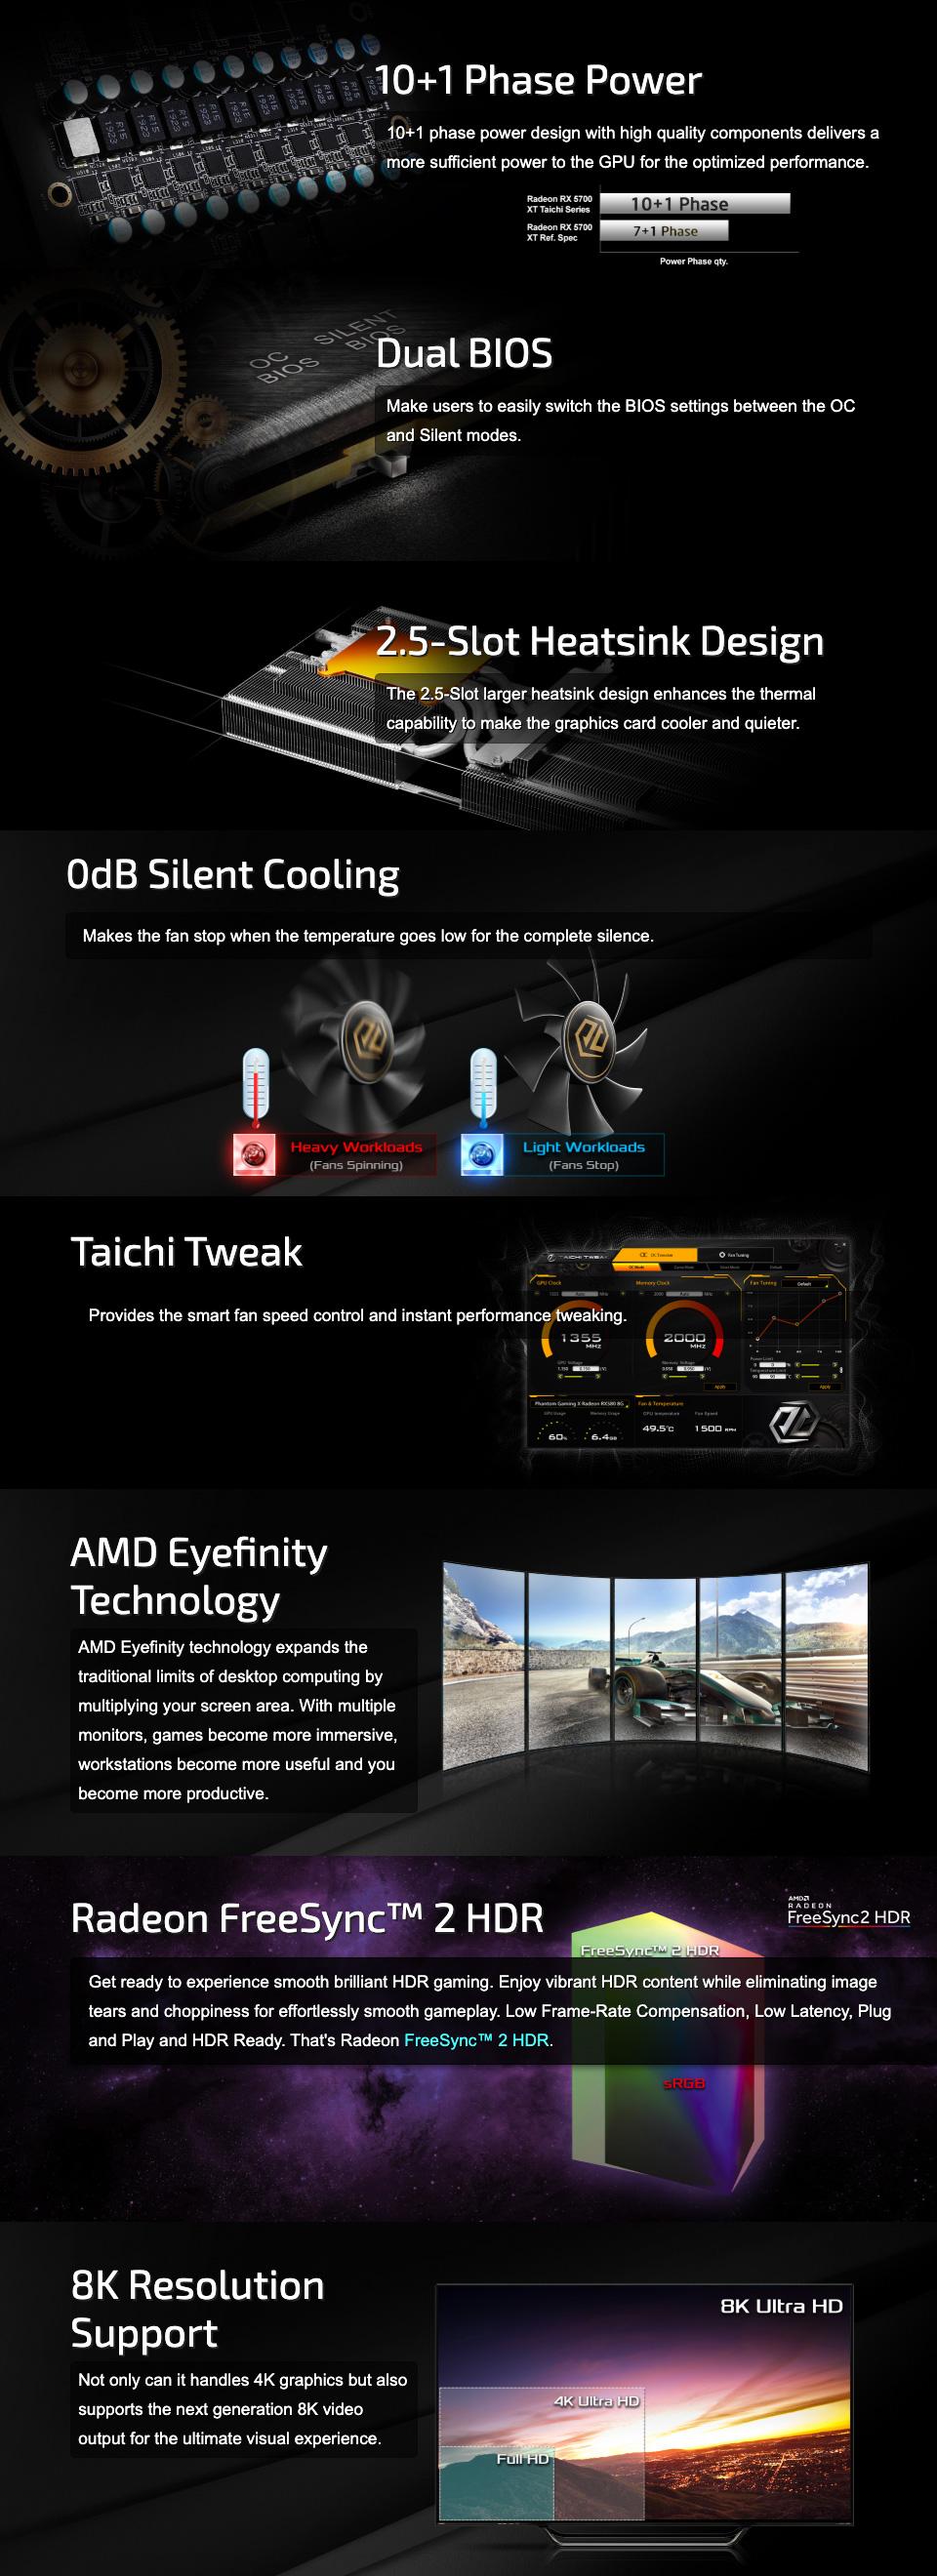 ASRock Taichi Radeon RX 5700 XT 8GB features